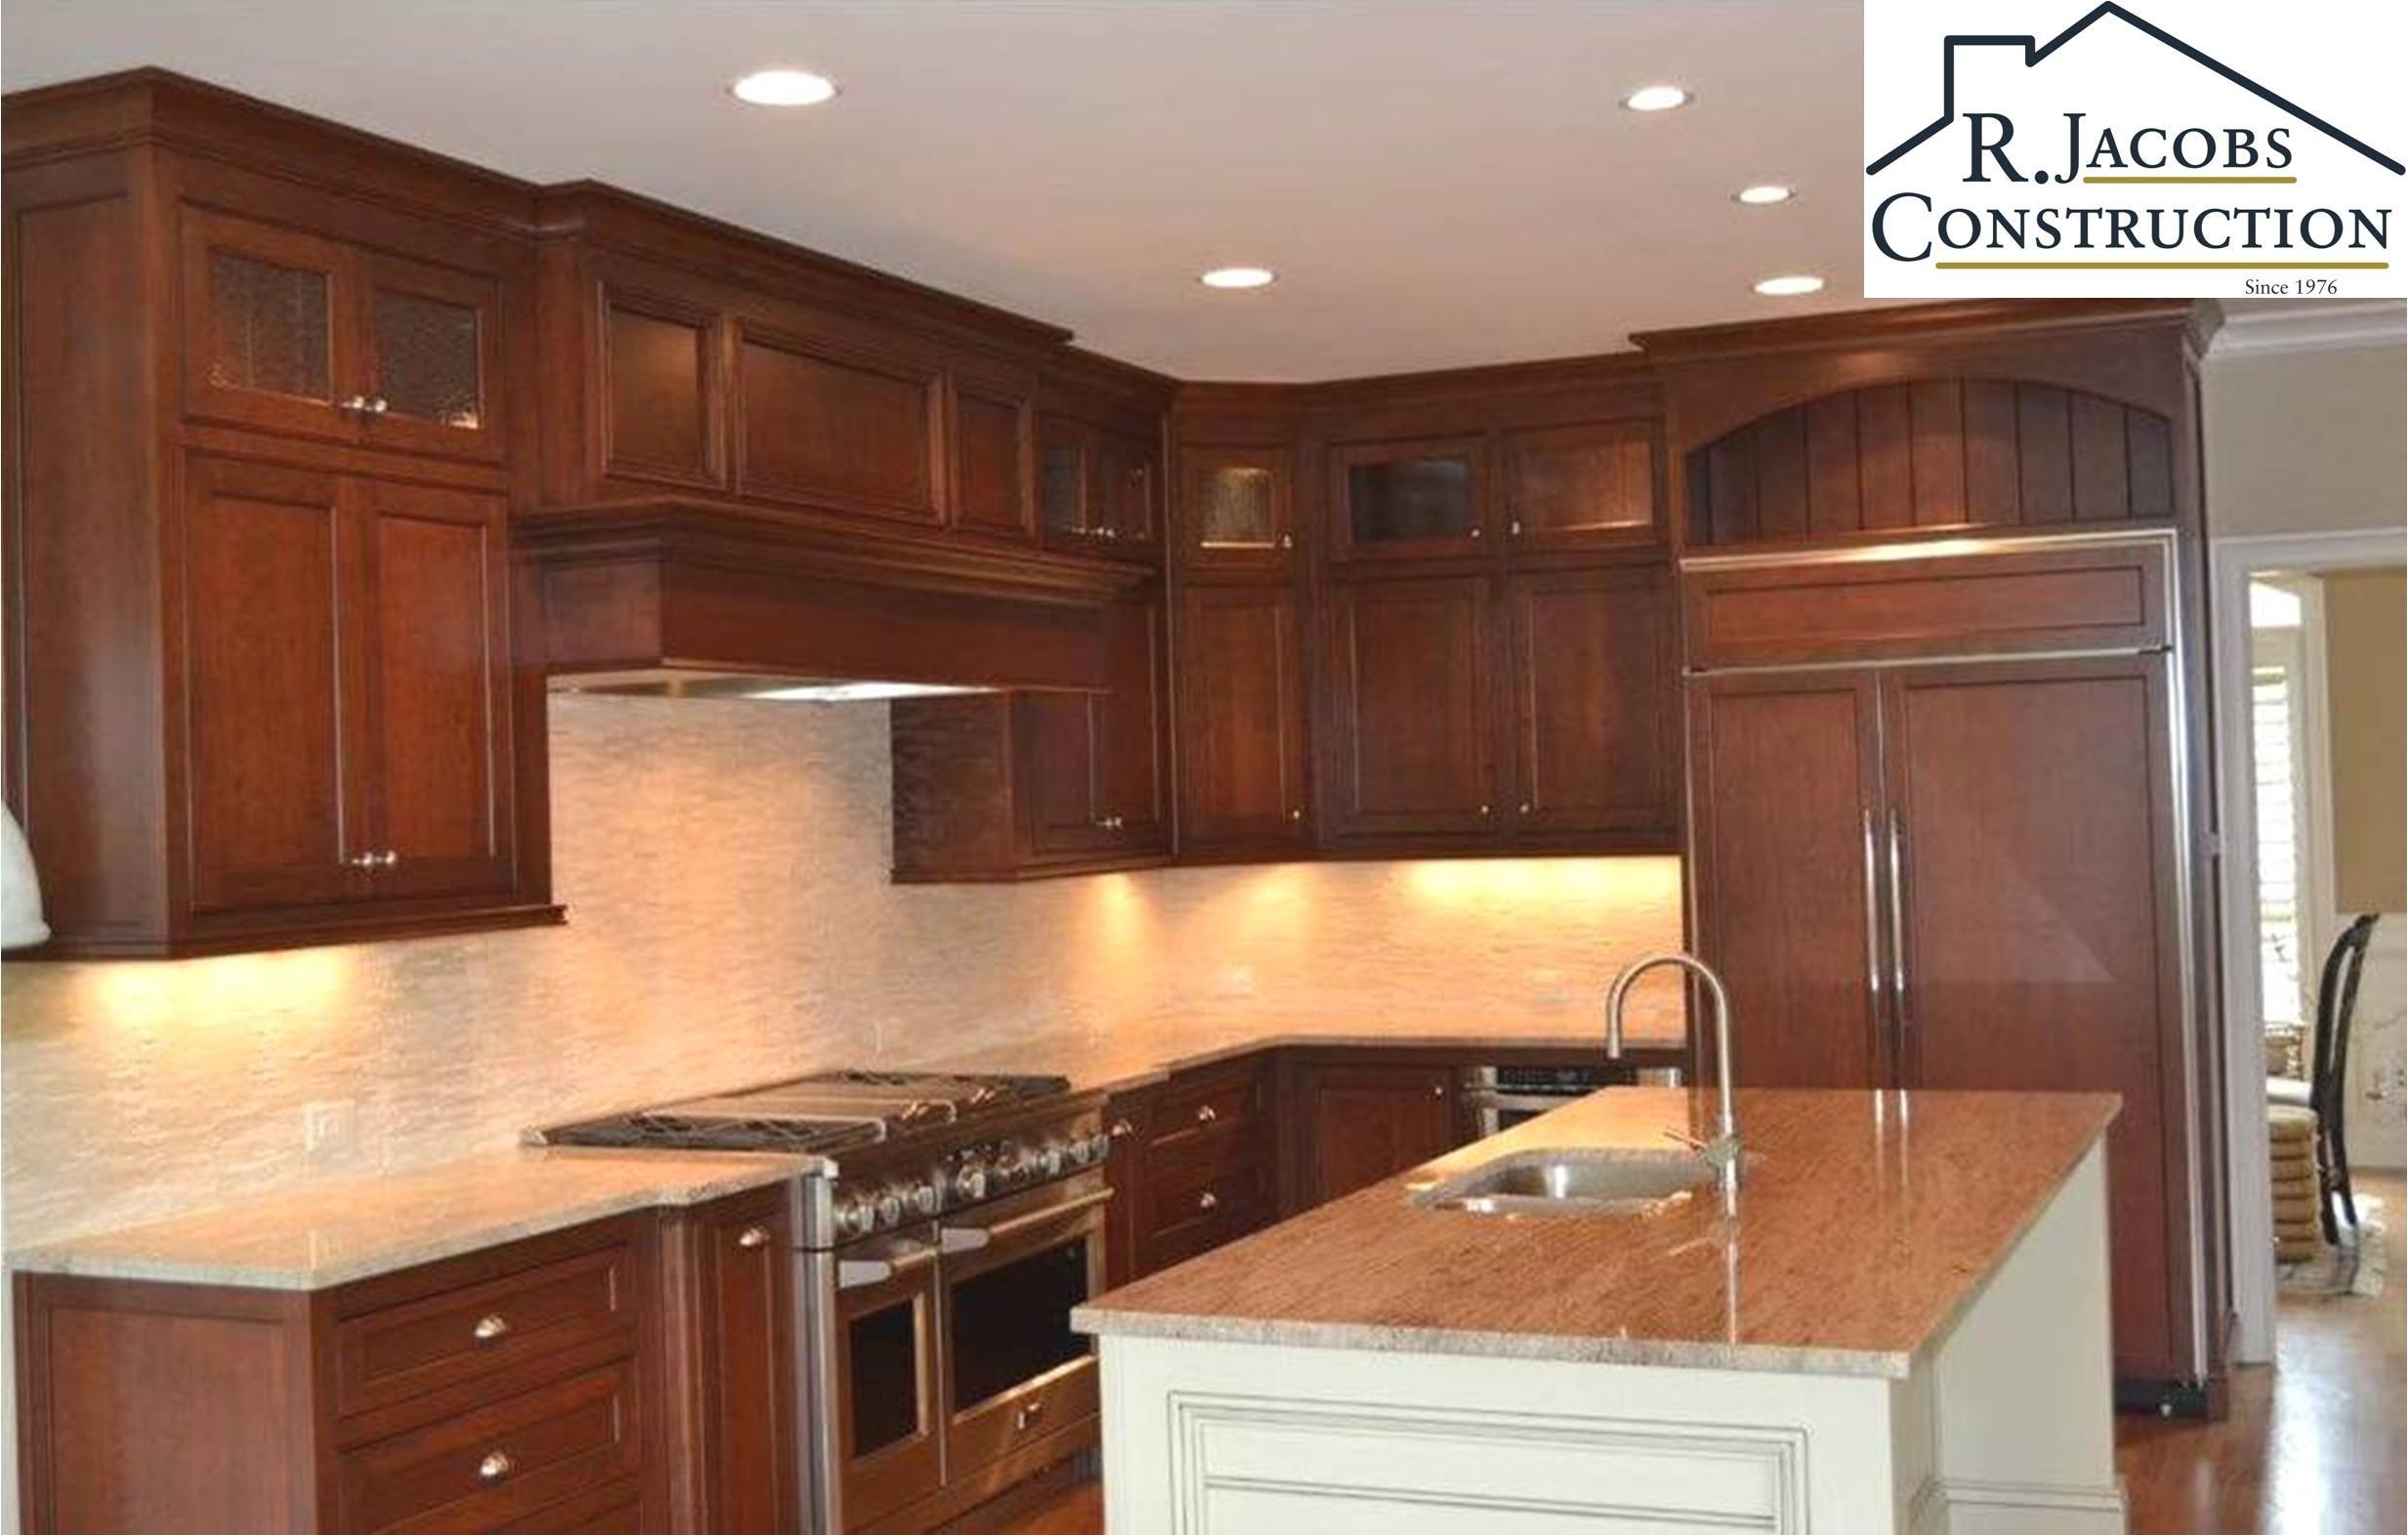 Kitchen Remodeling, Kitchen Renovation, Kitchen Design, R Jacobs ...